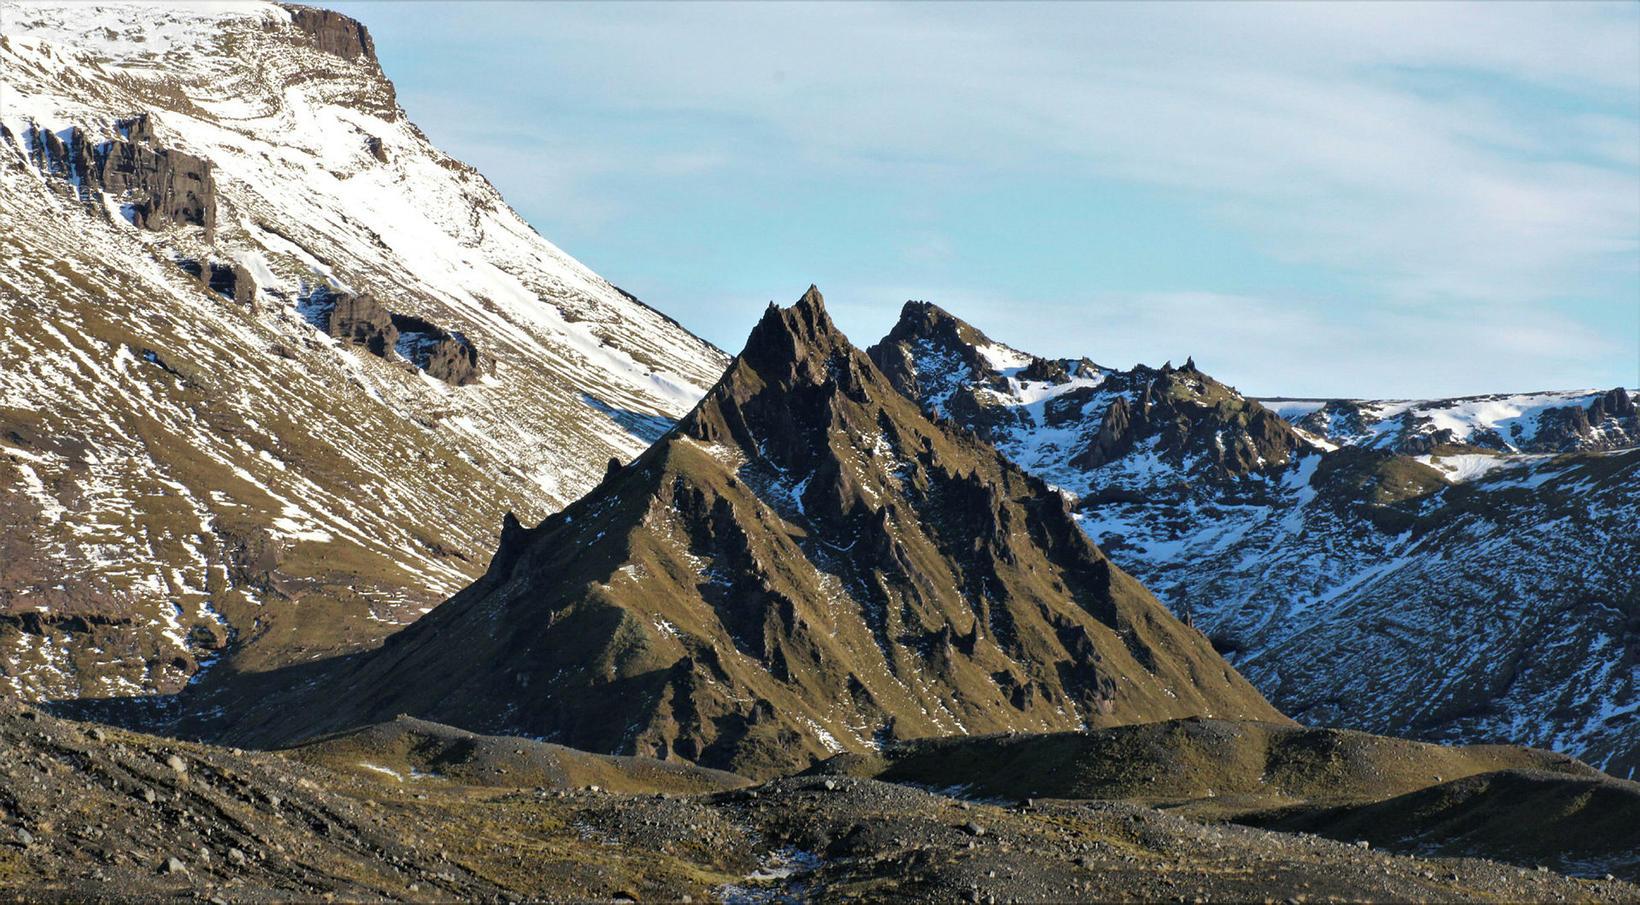 The mountain Kurl, near the glacier.